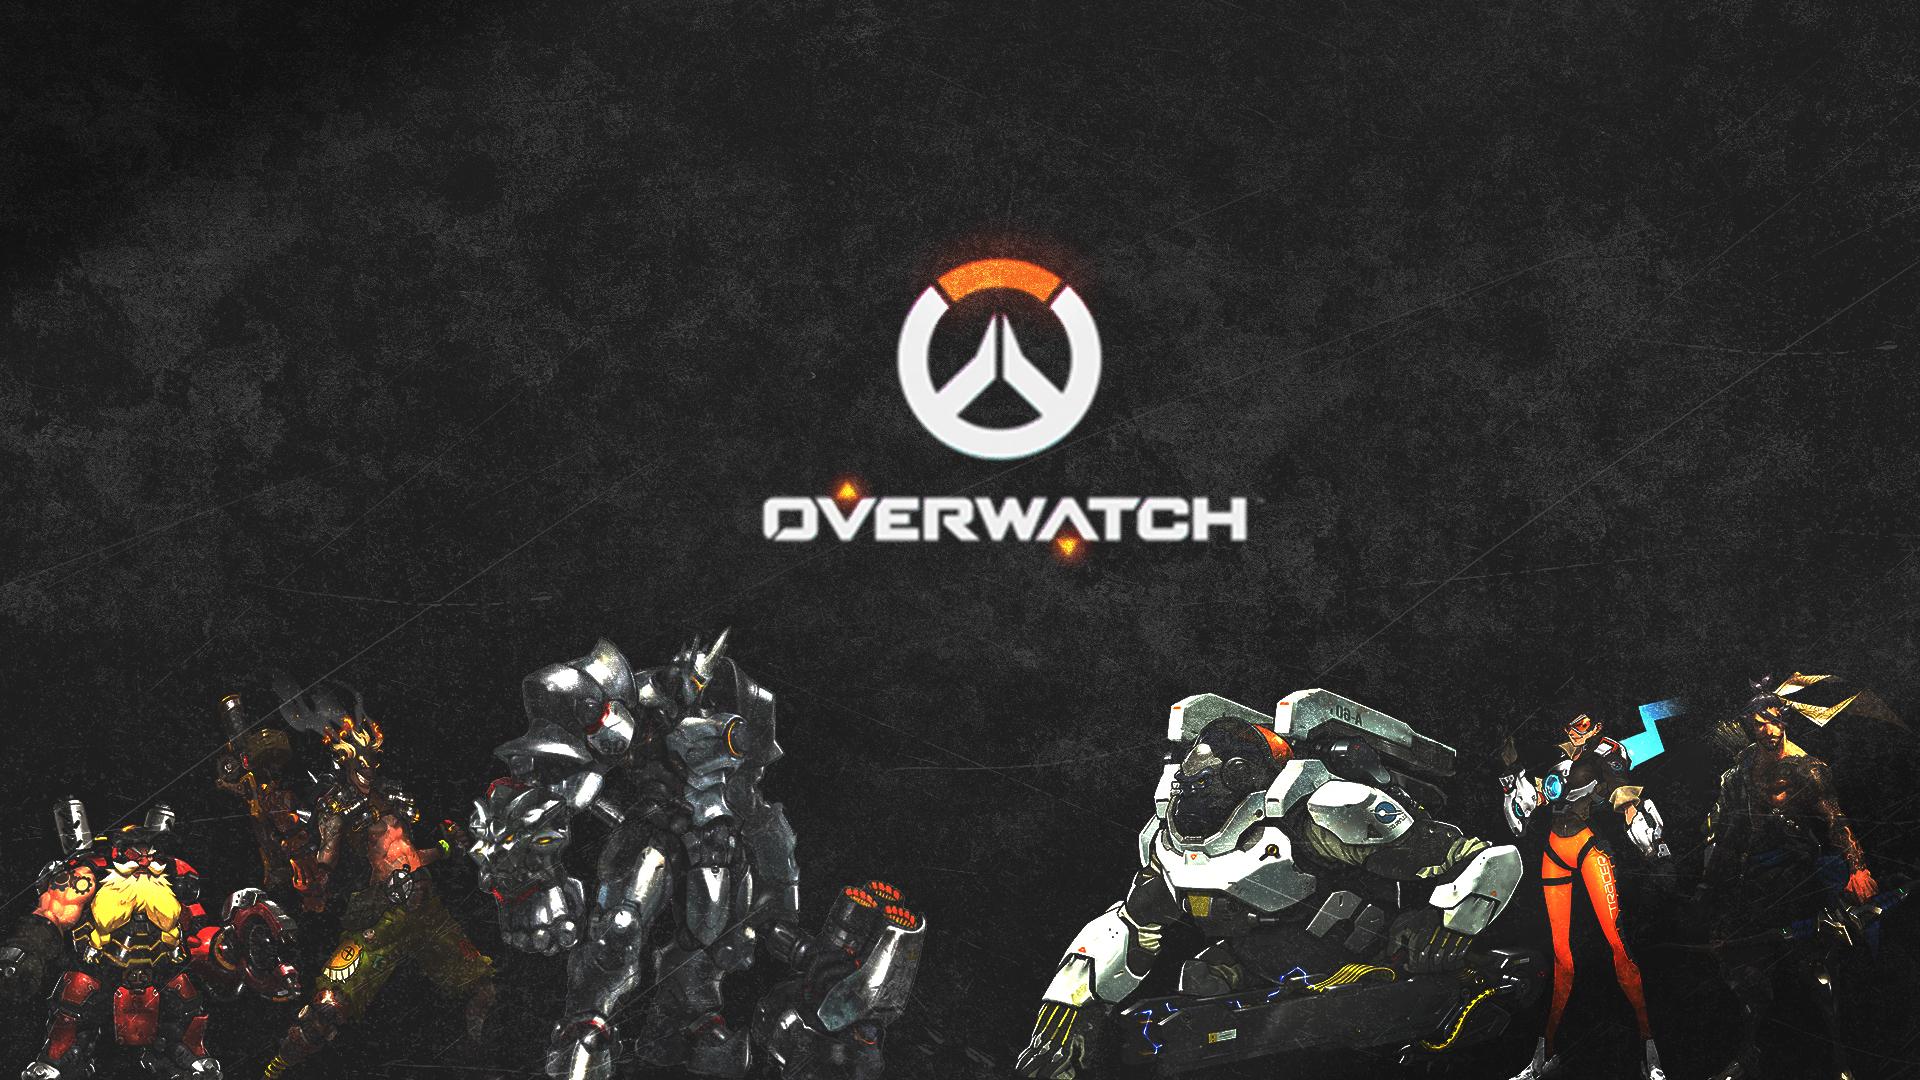 Popular Wallpaper High Quality Overwatch - Overwatch-Wallpaper-Gallery  Image_37525.jpg